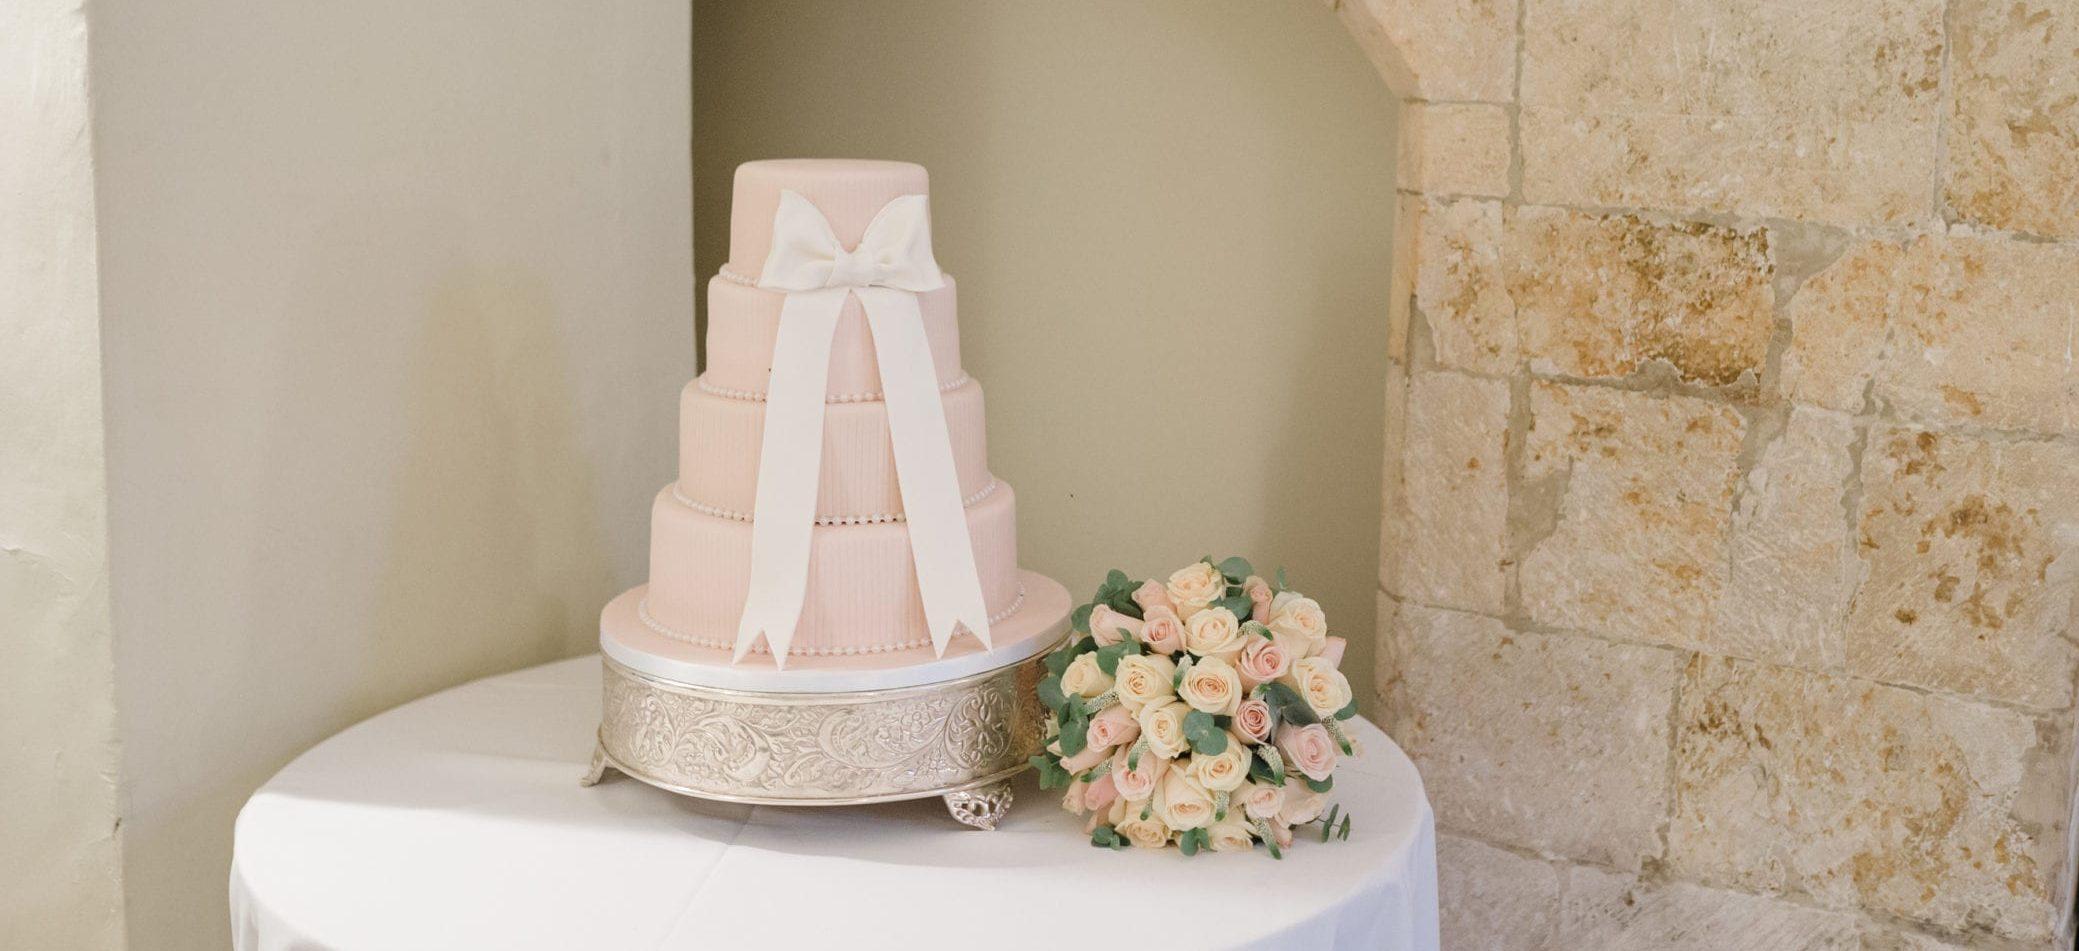 Pretty wedding cake at Farnham Castle in Surrey